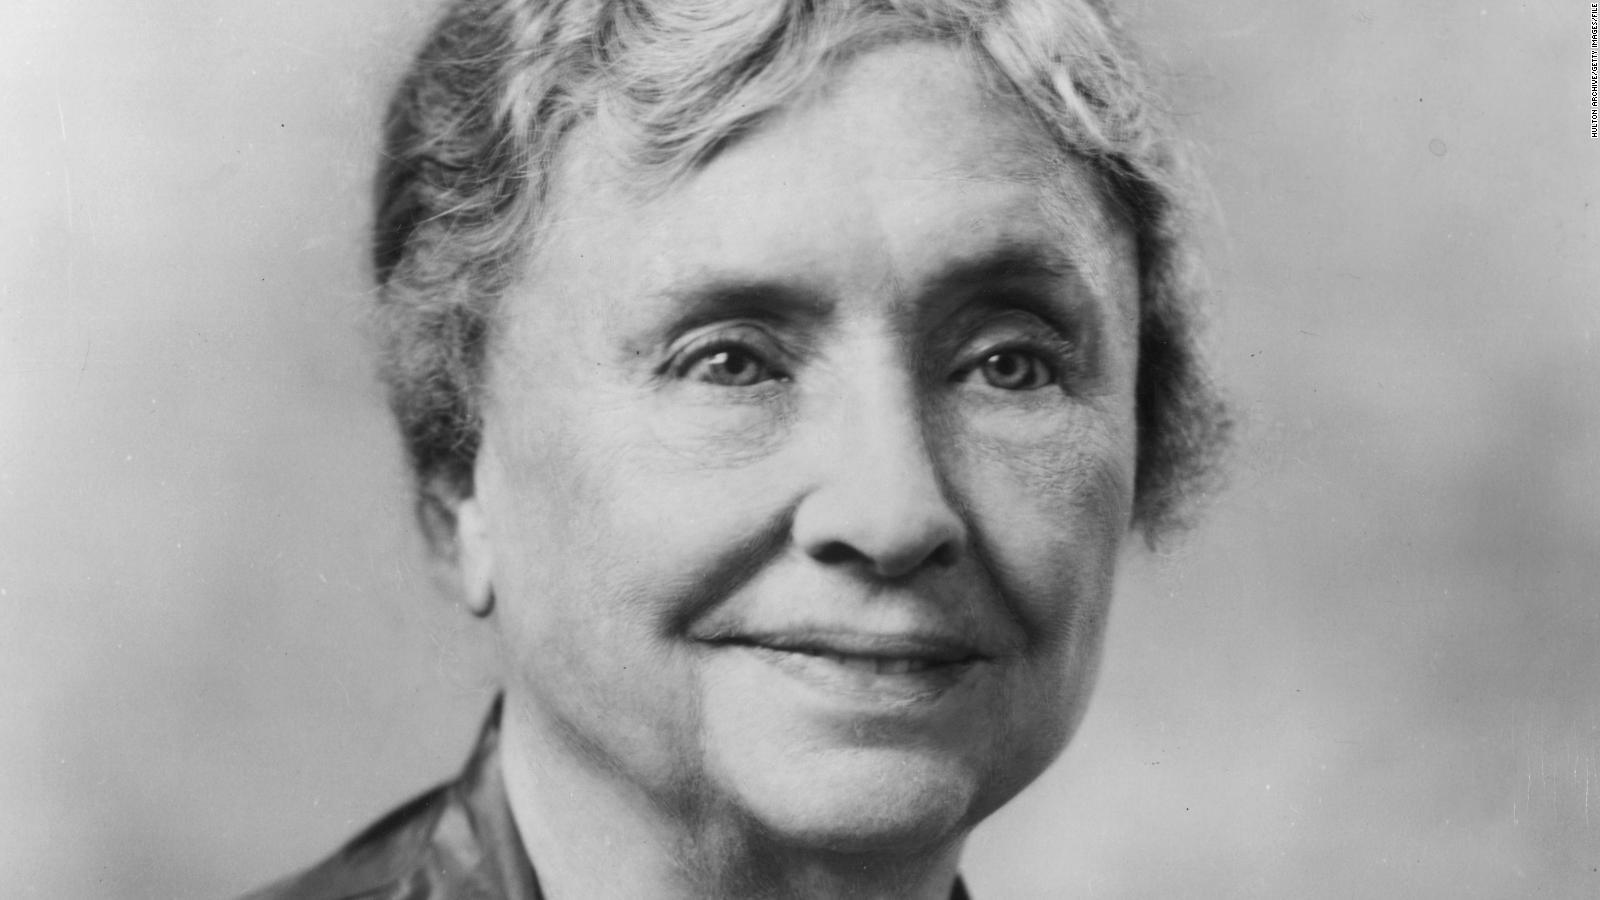 Helen Keller, Author, political activist, and lecturer